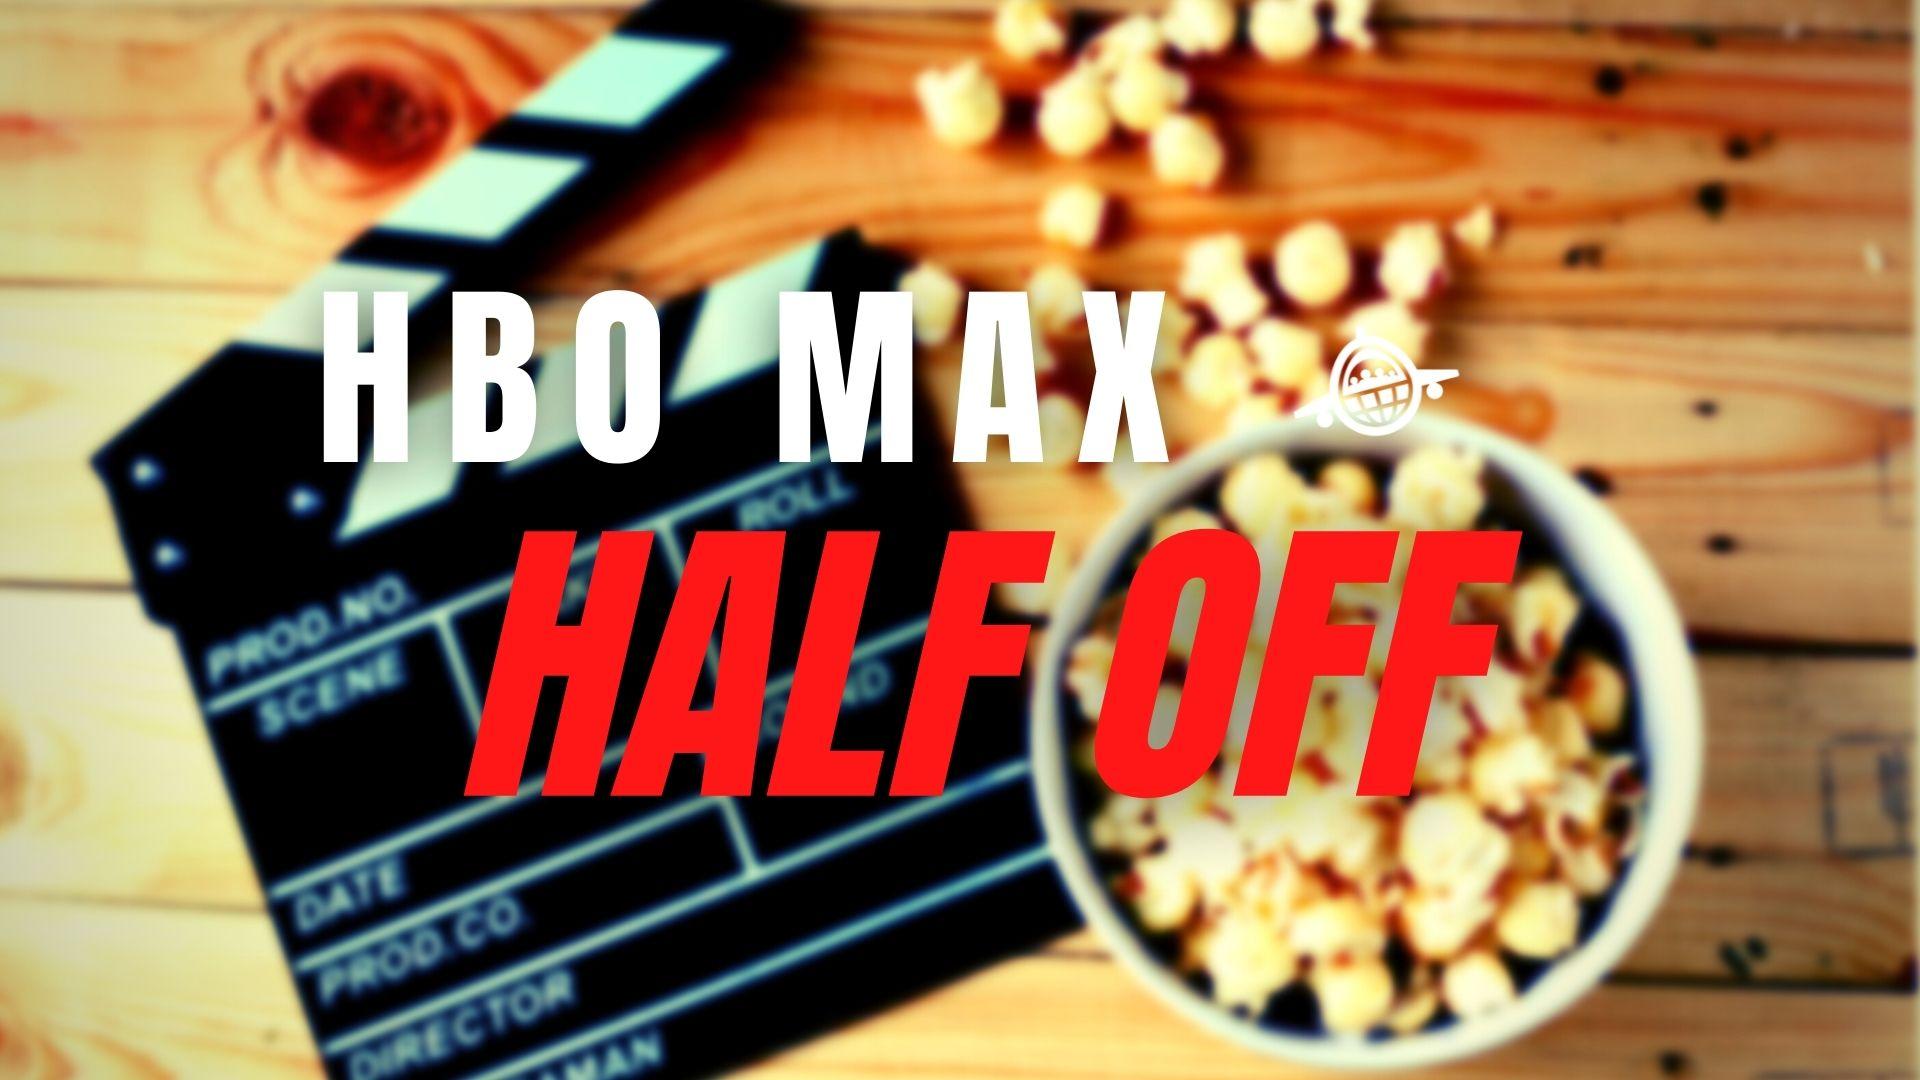 HBO Max Half Off